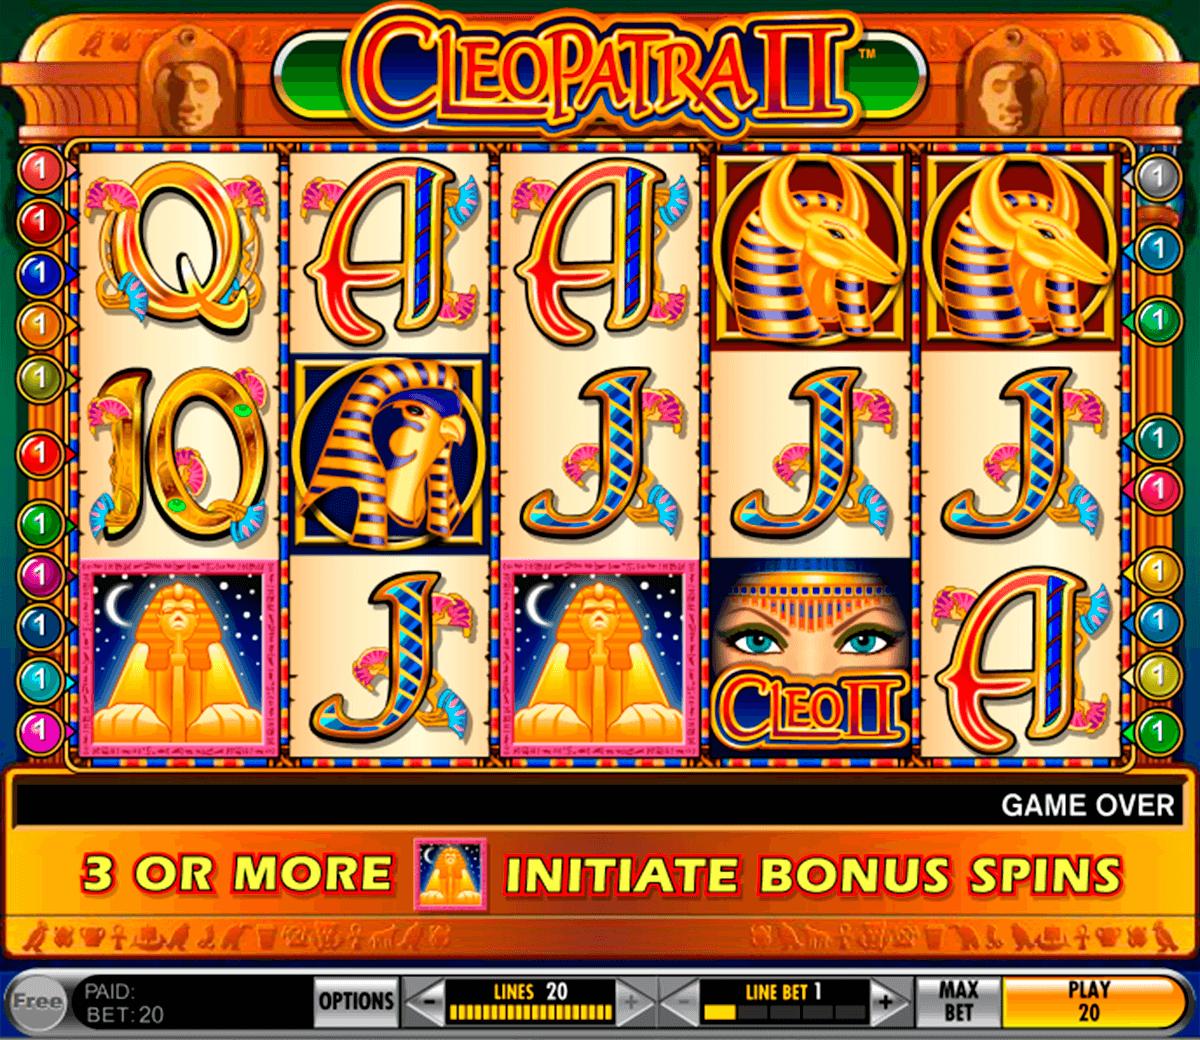 Maquinas tragamonedas gratis cleopatra jugar Rambo-310475